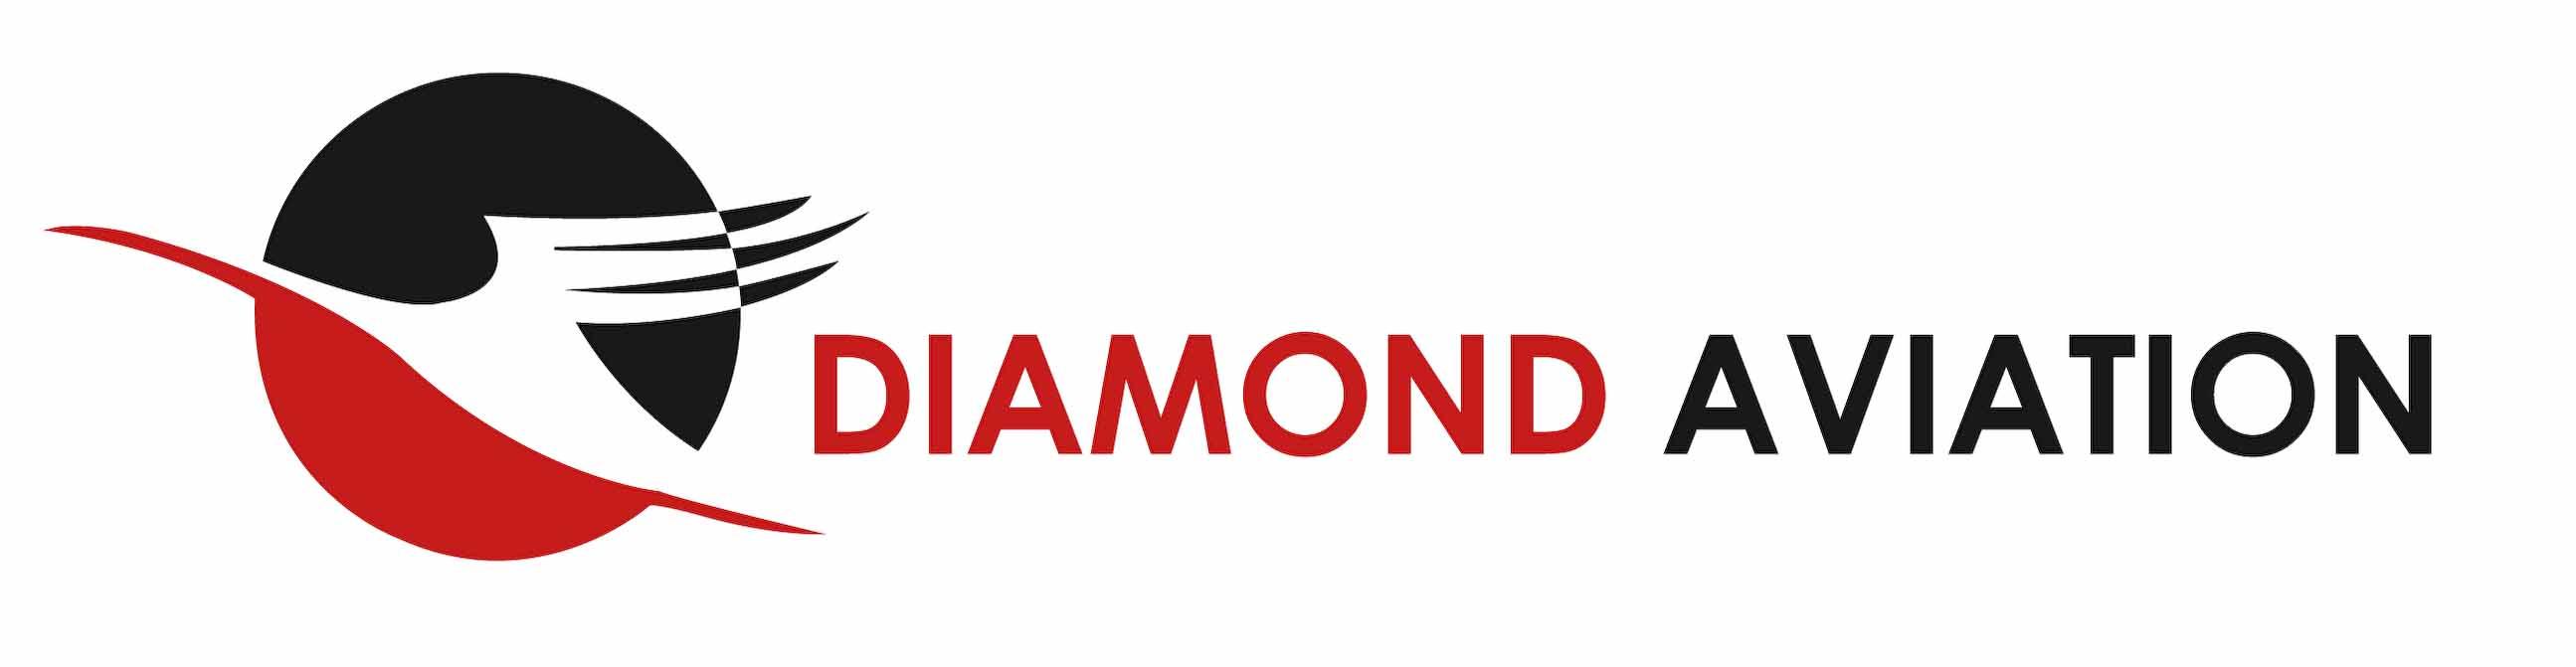 Diamond Aviation Pte. Ltd.>